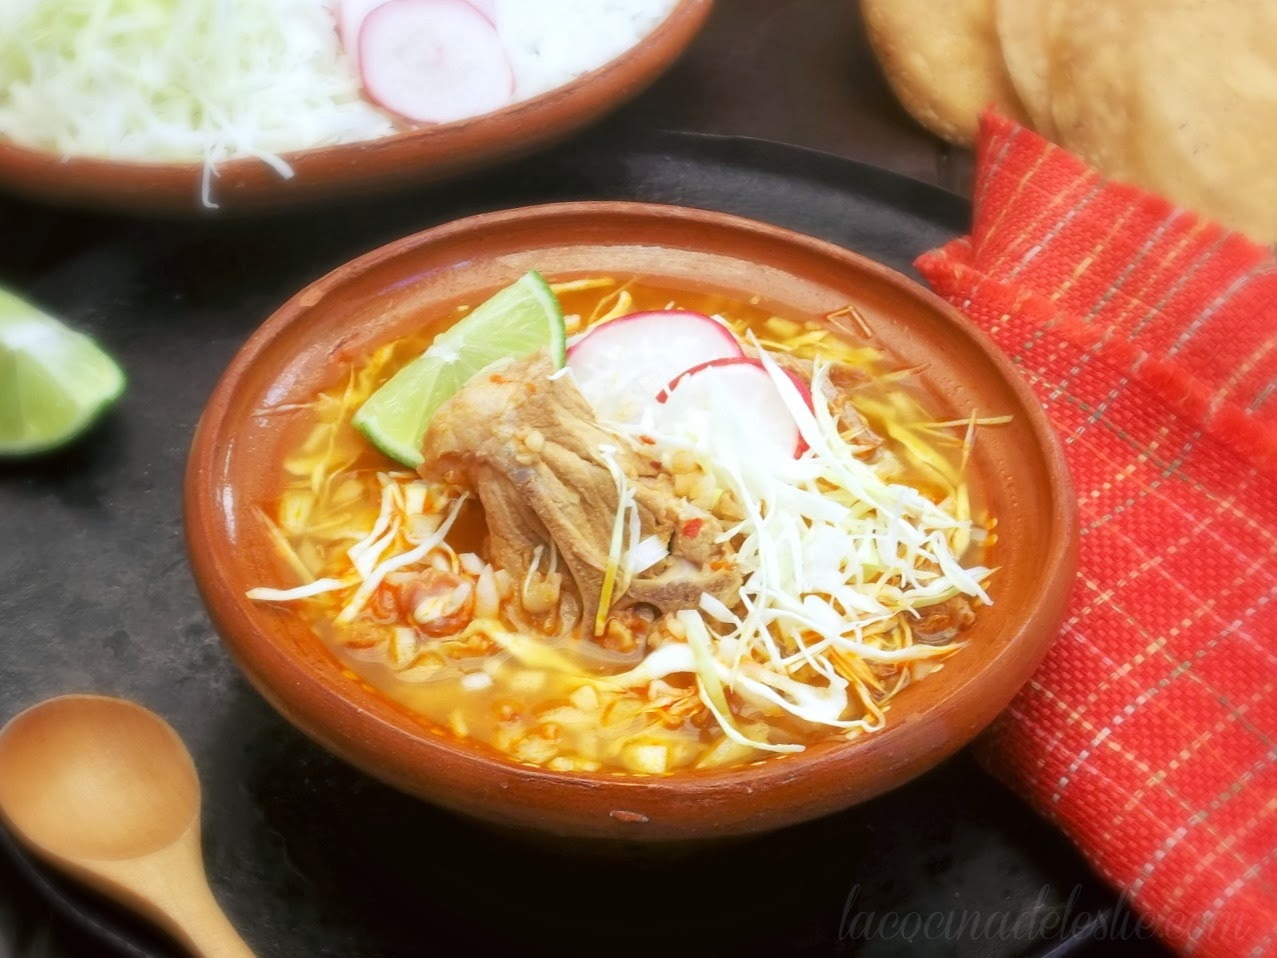 Mexican Red Pork Pozole recipe - lacocinadeleslie.com